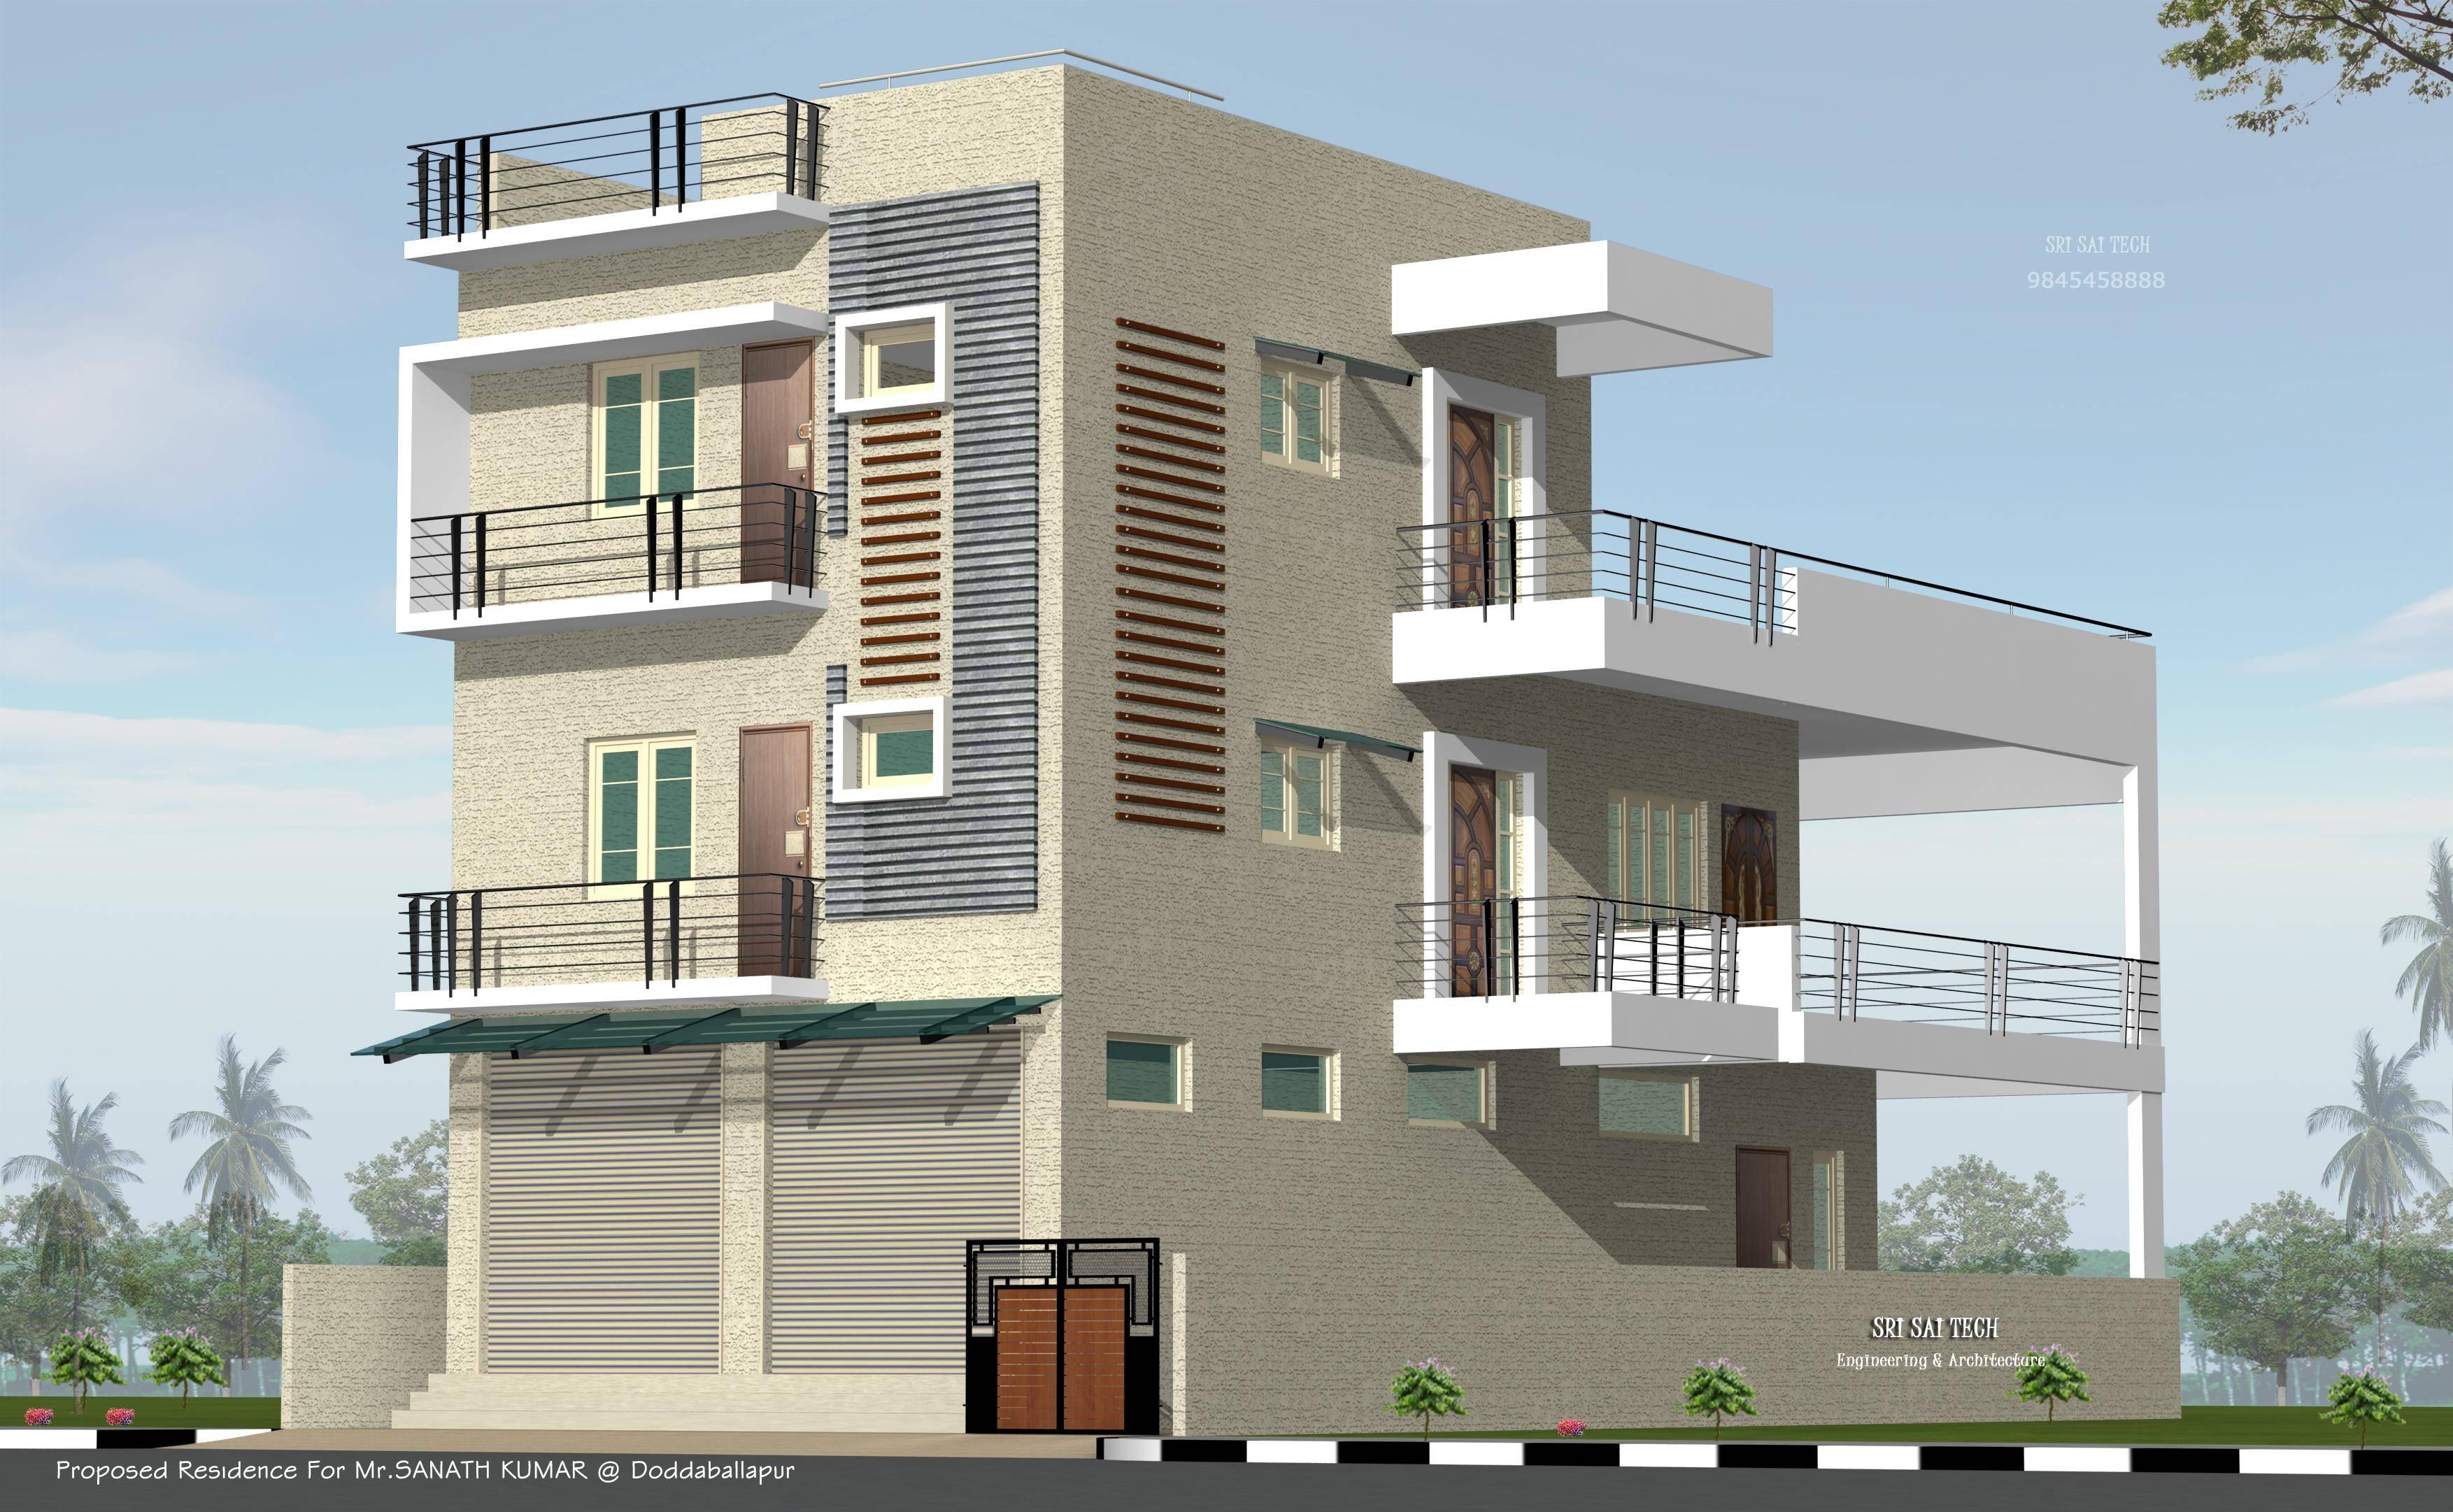 Elevation kerala style front elevation exterior elevation designs - New Building Elevations Folkartstorescom Modern House Design Elevations